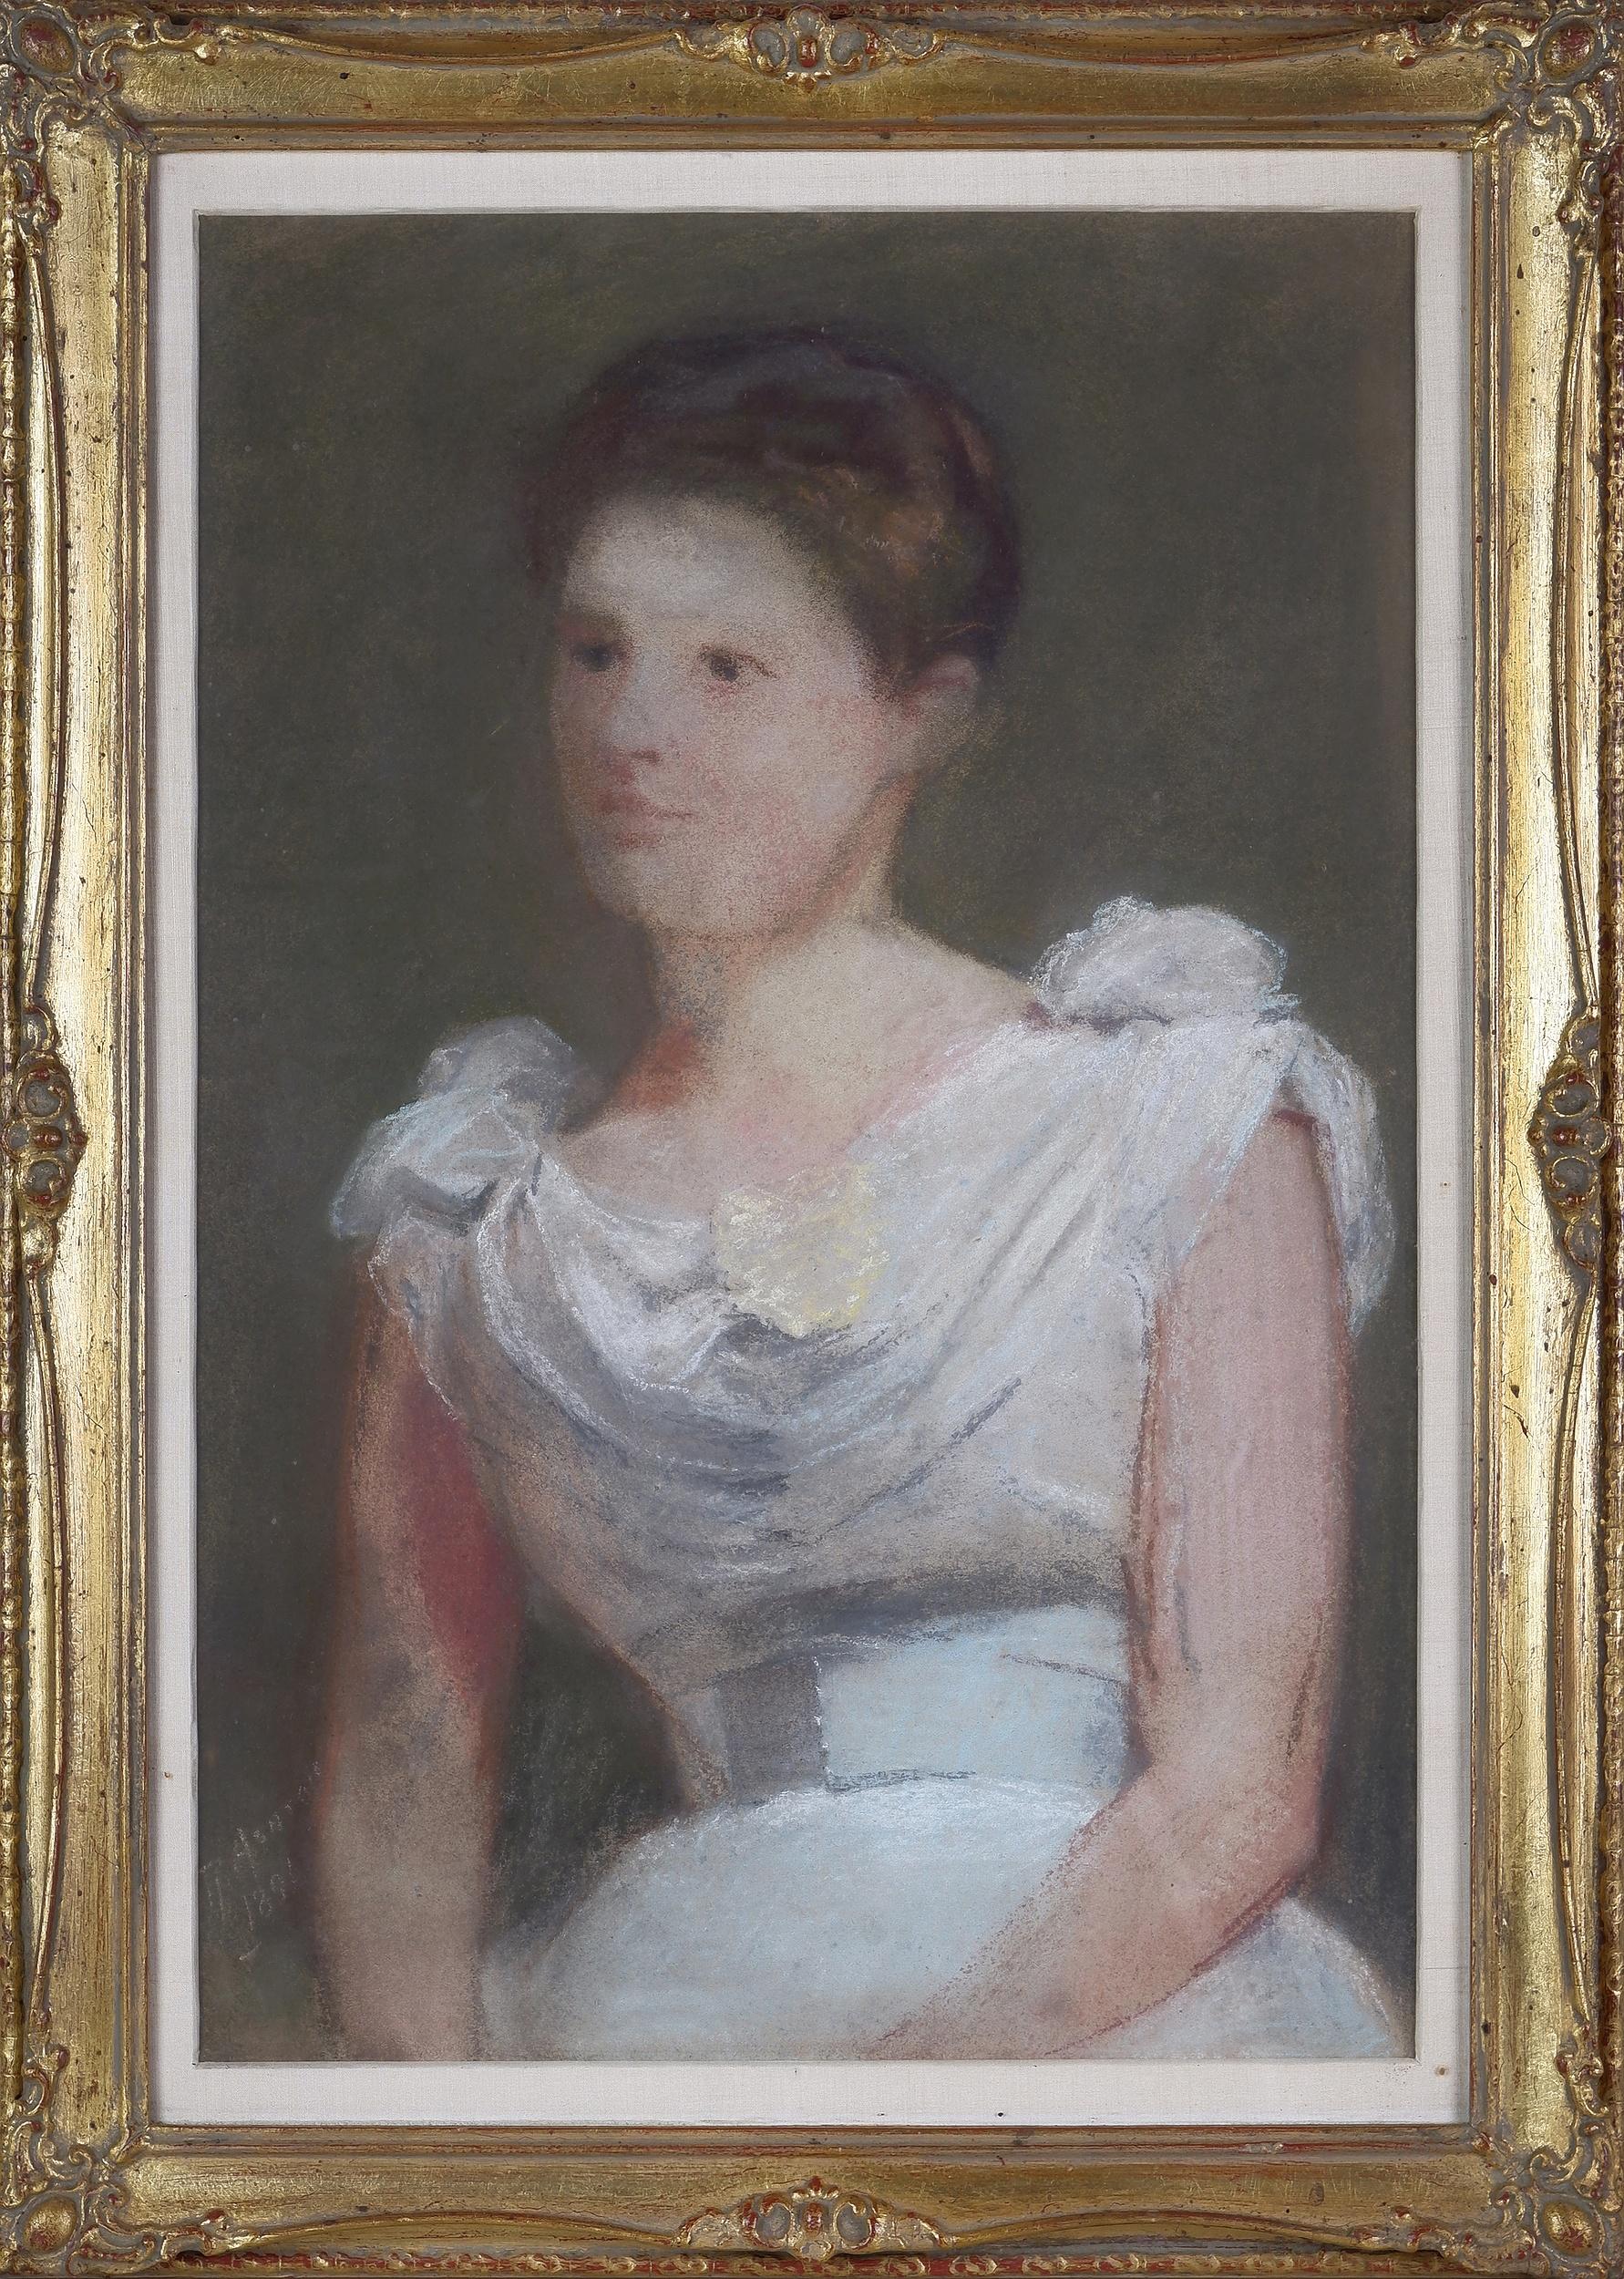 'Julian Rossi Ashton (1851-1942), (Possibly) Portrait of Dame Nellie Melba 1891, Pastel on Paper'